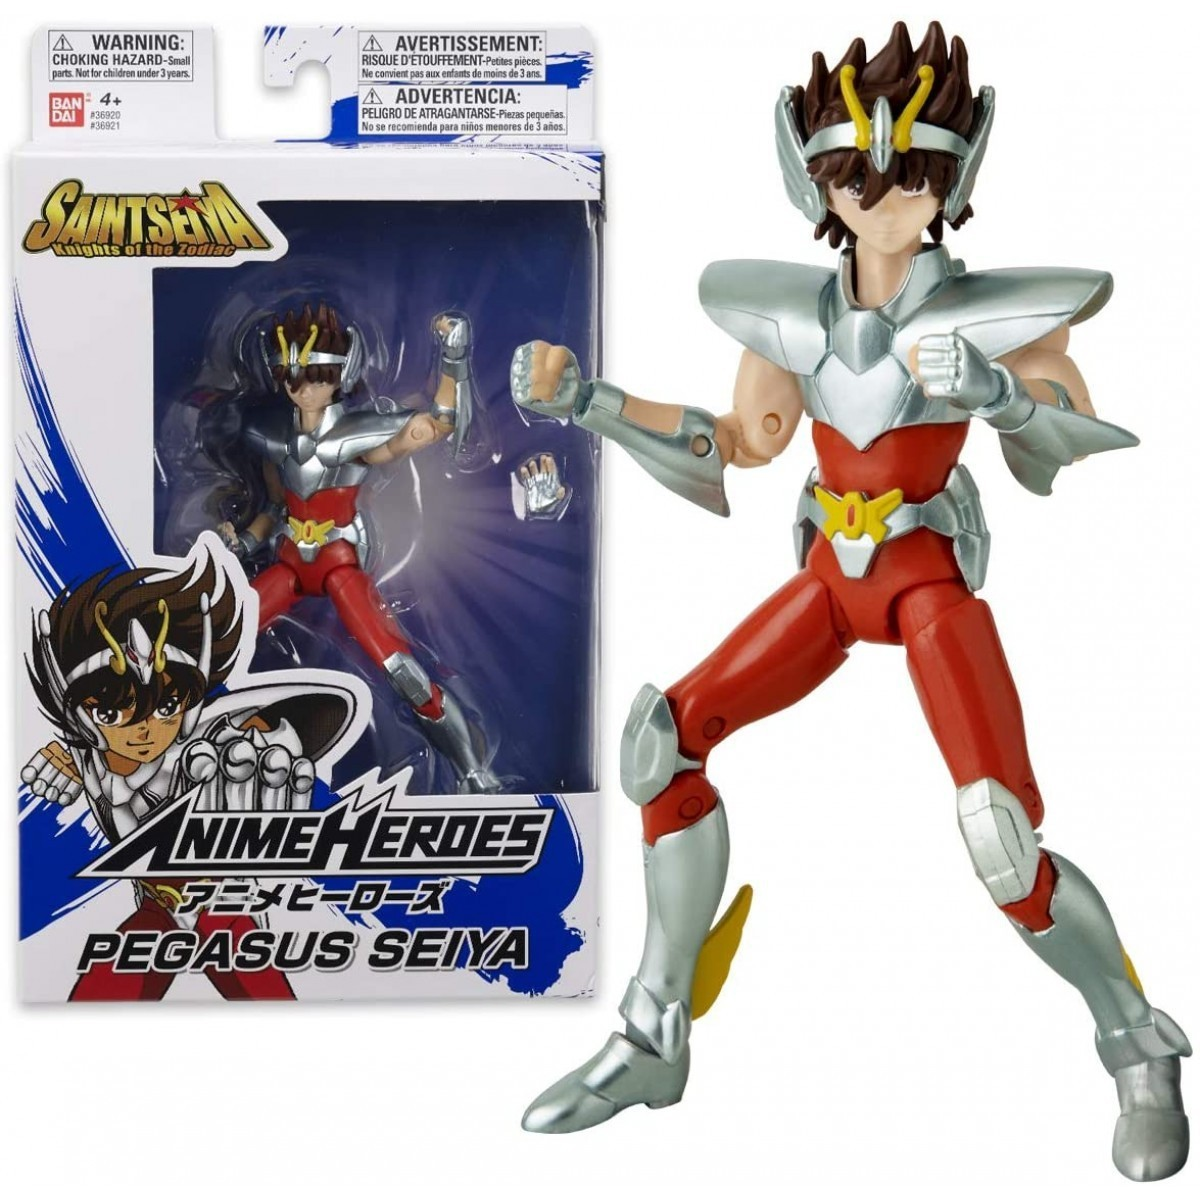 Action Figure Seiya de Pegasus: Os Cavaleiros dos Zodíaco (Anime Heroes) Boneco Colecionável - Bandai